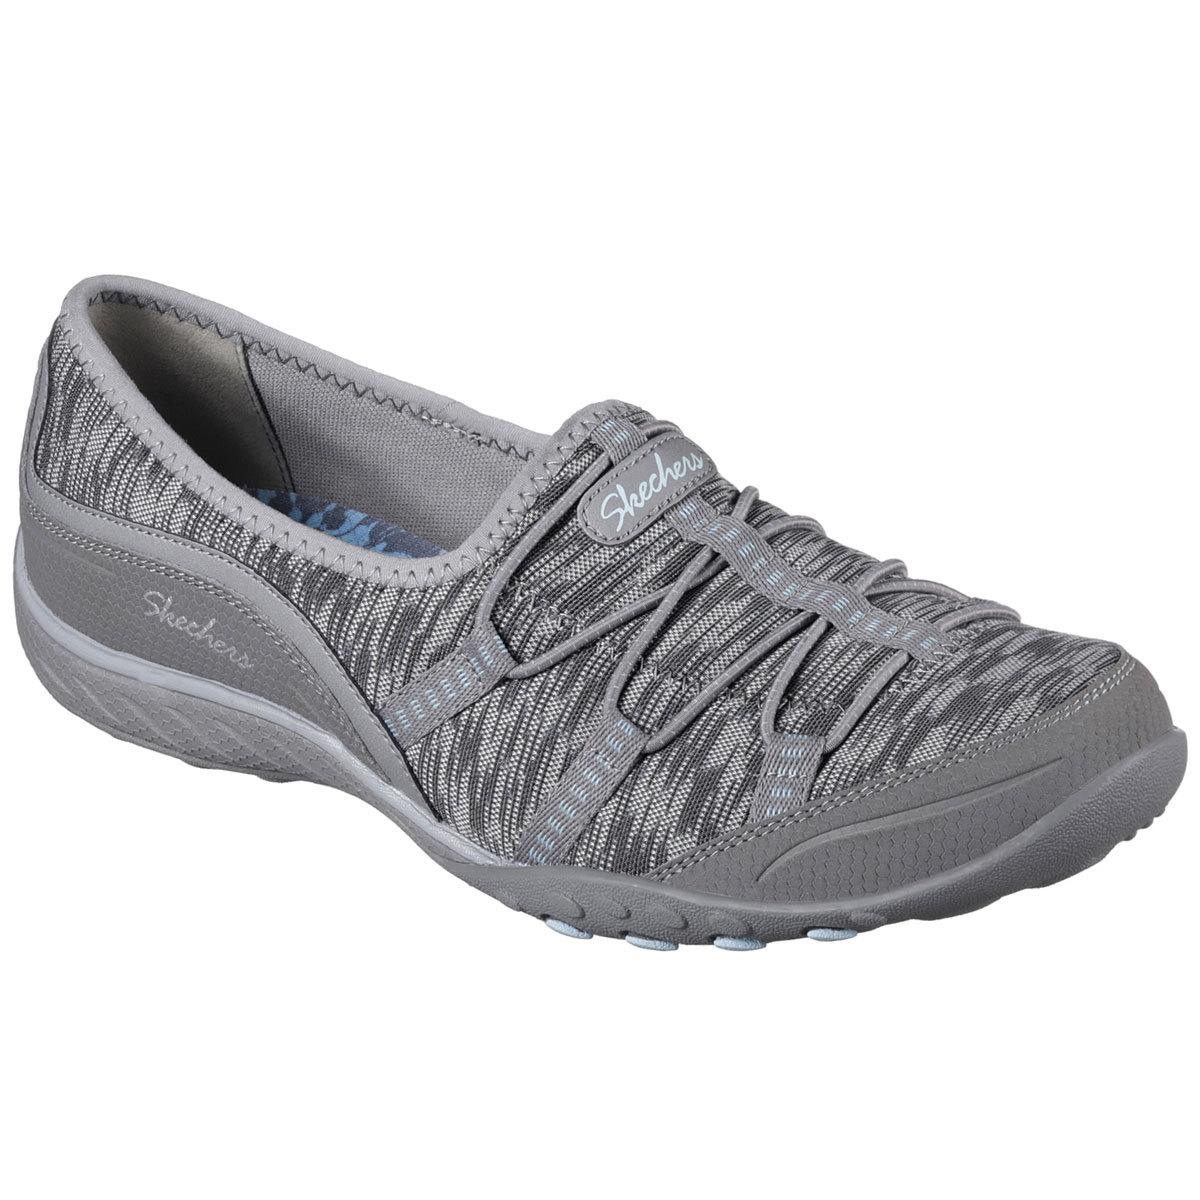 skechers walking shoes skechers womenu0026rsquo;s relaxed fit: breathe easy u0026ndash; golden walking  shoes - golden XCJFLPD